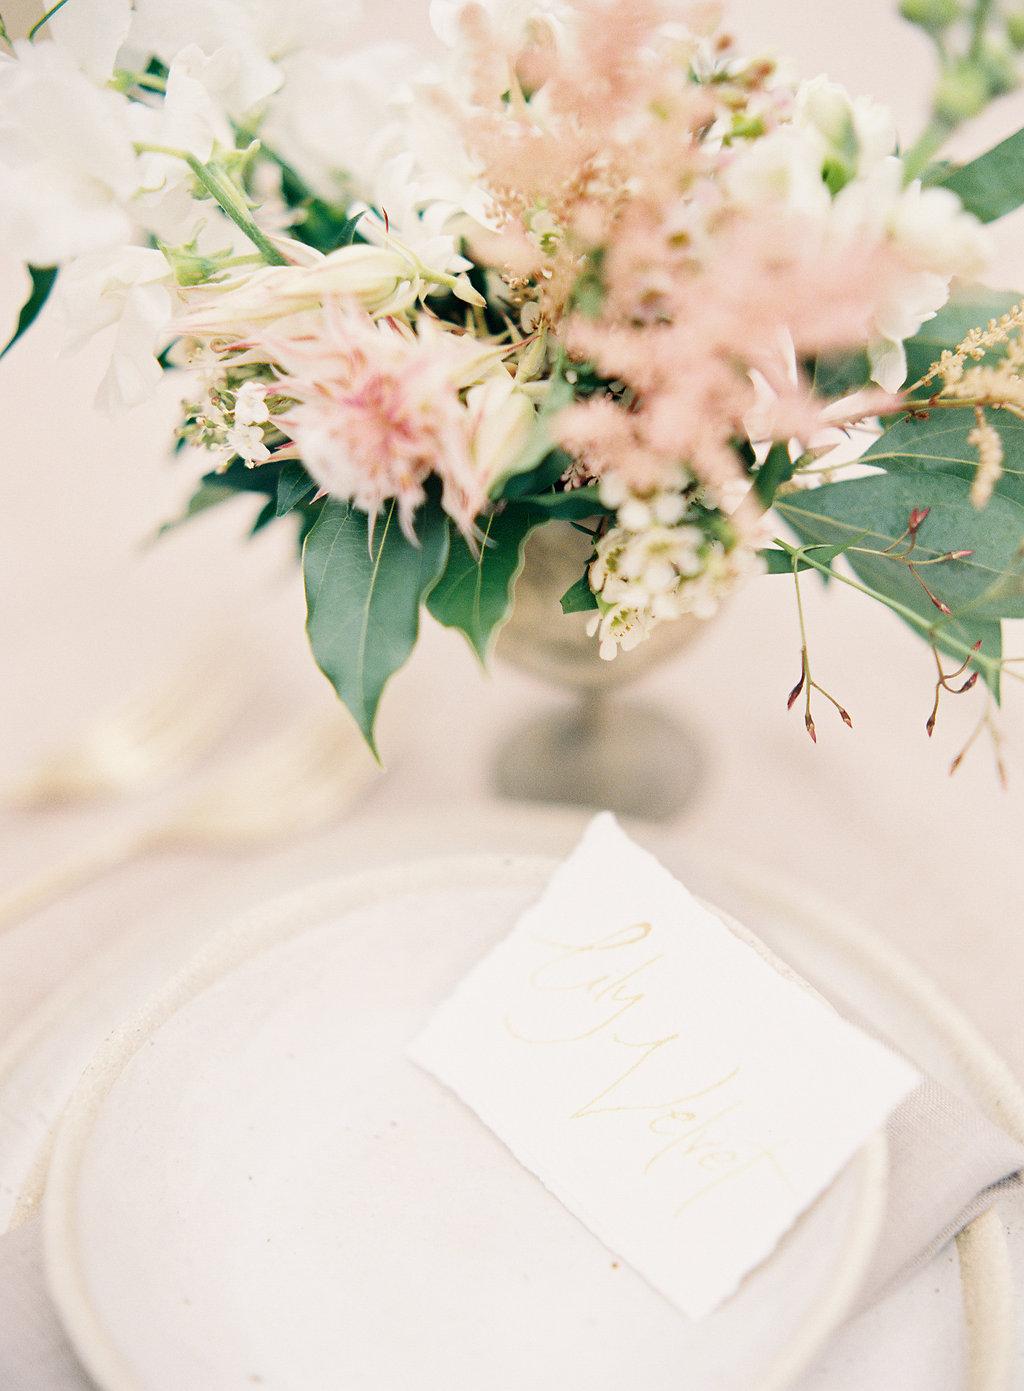 floral table details